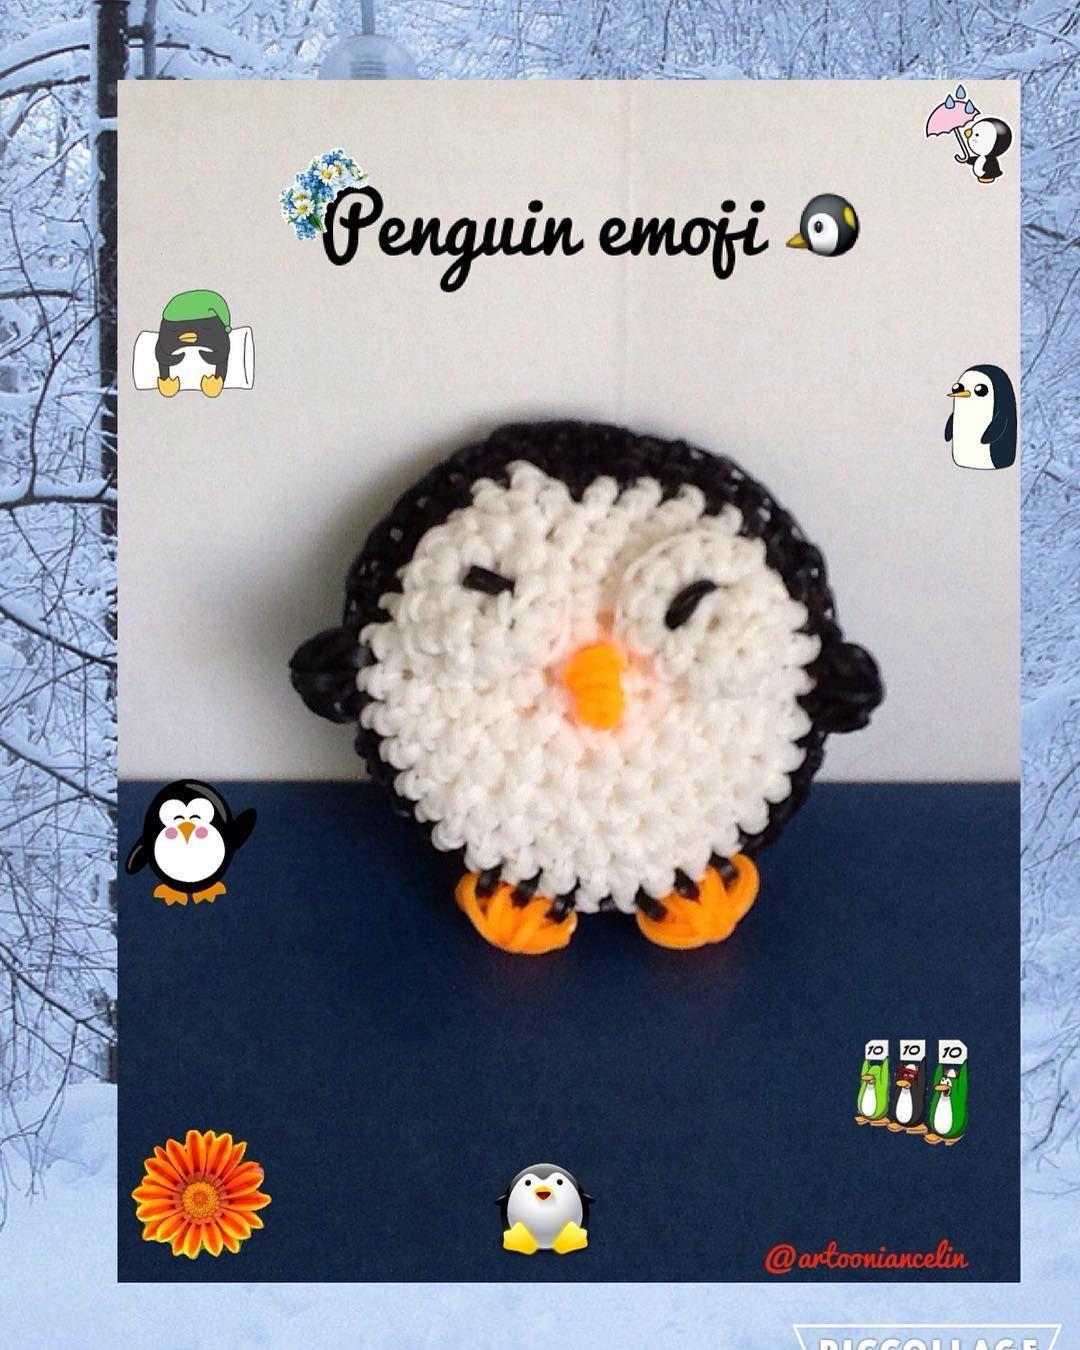 Penguin emoji made by me! #emoji #loomigurumi #amigurumi #penguin #snow…